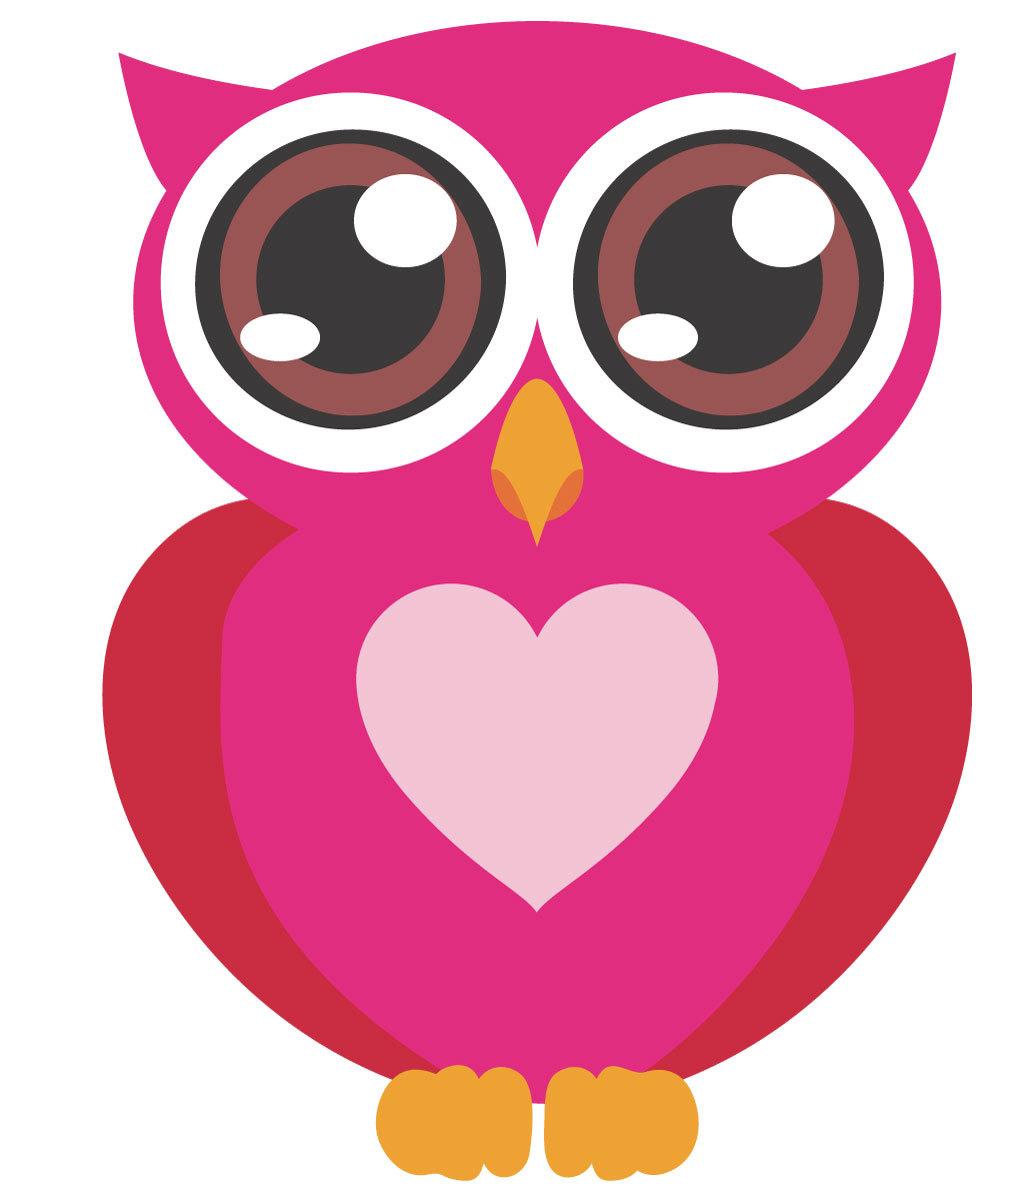 Pink Baby Owl Clipart-pink baby owl clipart-16